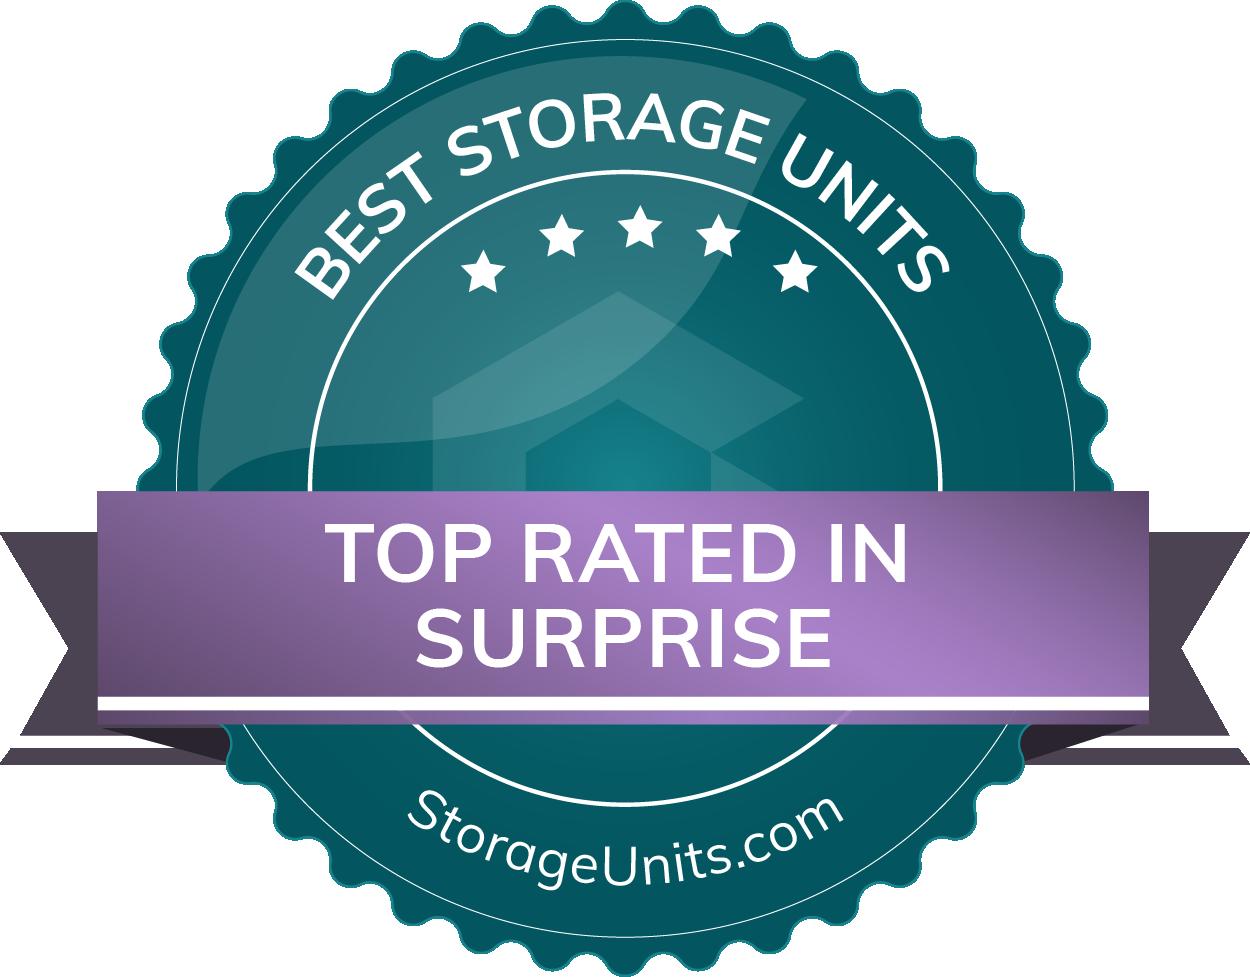 Best Self Storage Units in Surprise, AZ